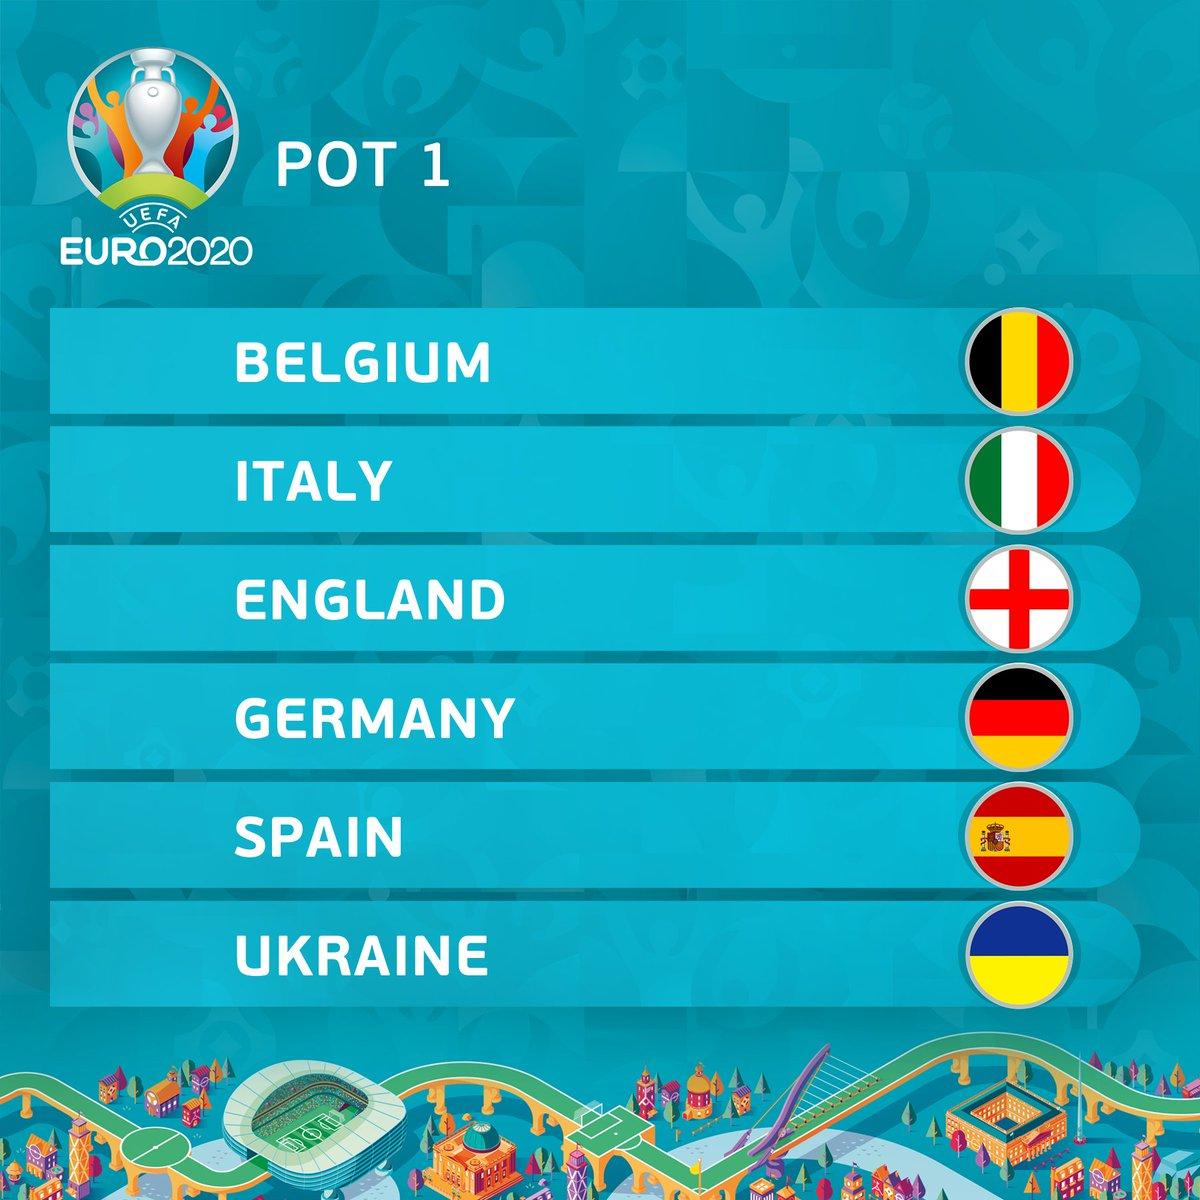 UEFA EURO 2020 on Twitter: